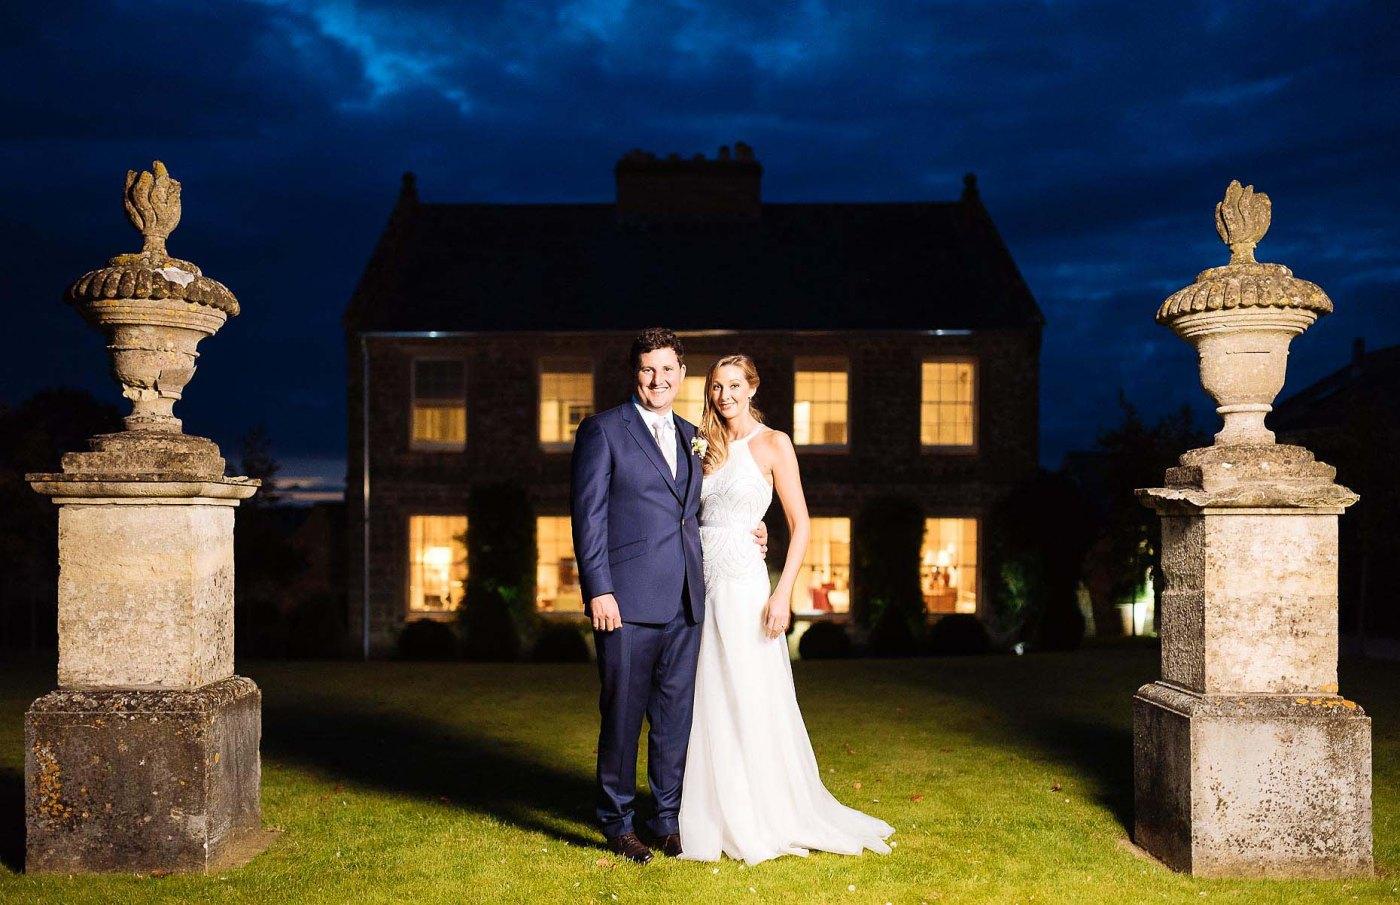 Vanessa & Jim's Wedding at Axnoller House, Dorset by Ben Pipe Wedding Photography - www.benpipeweddings.com